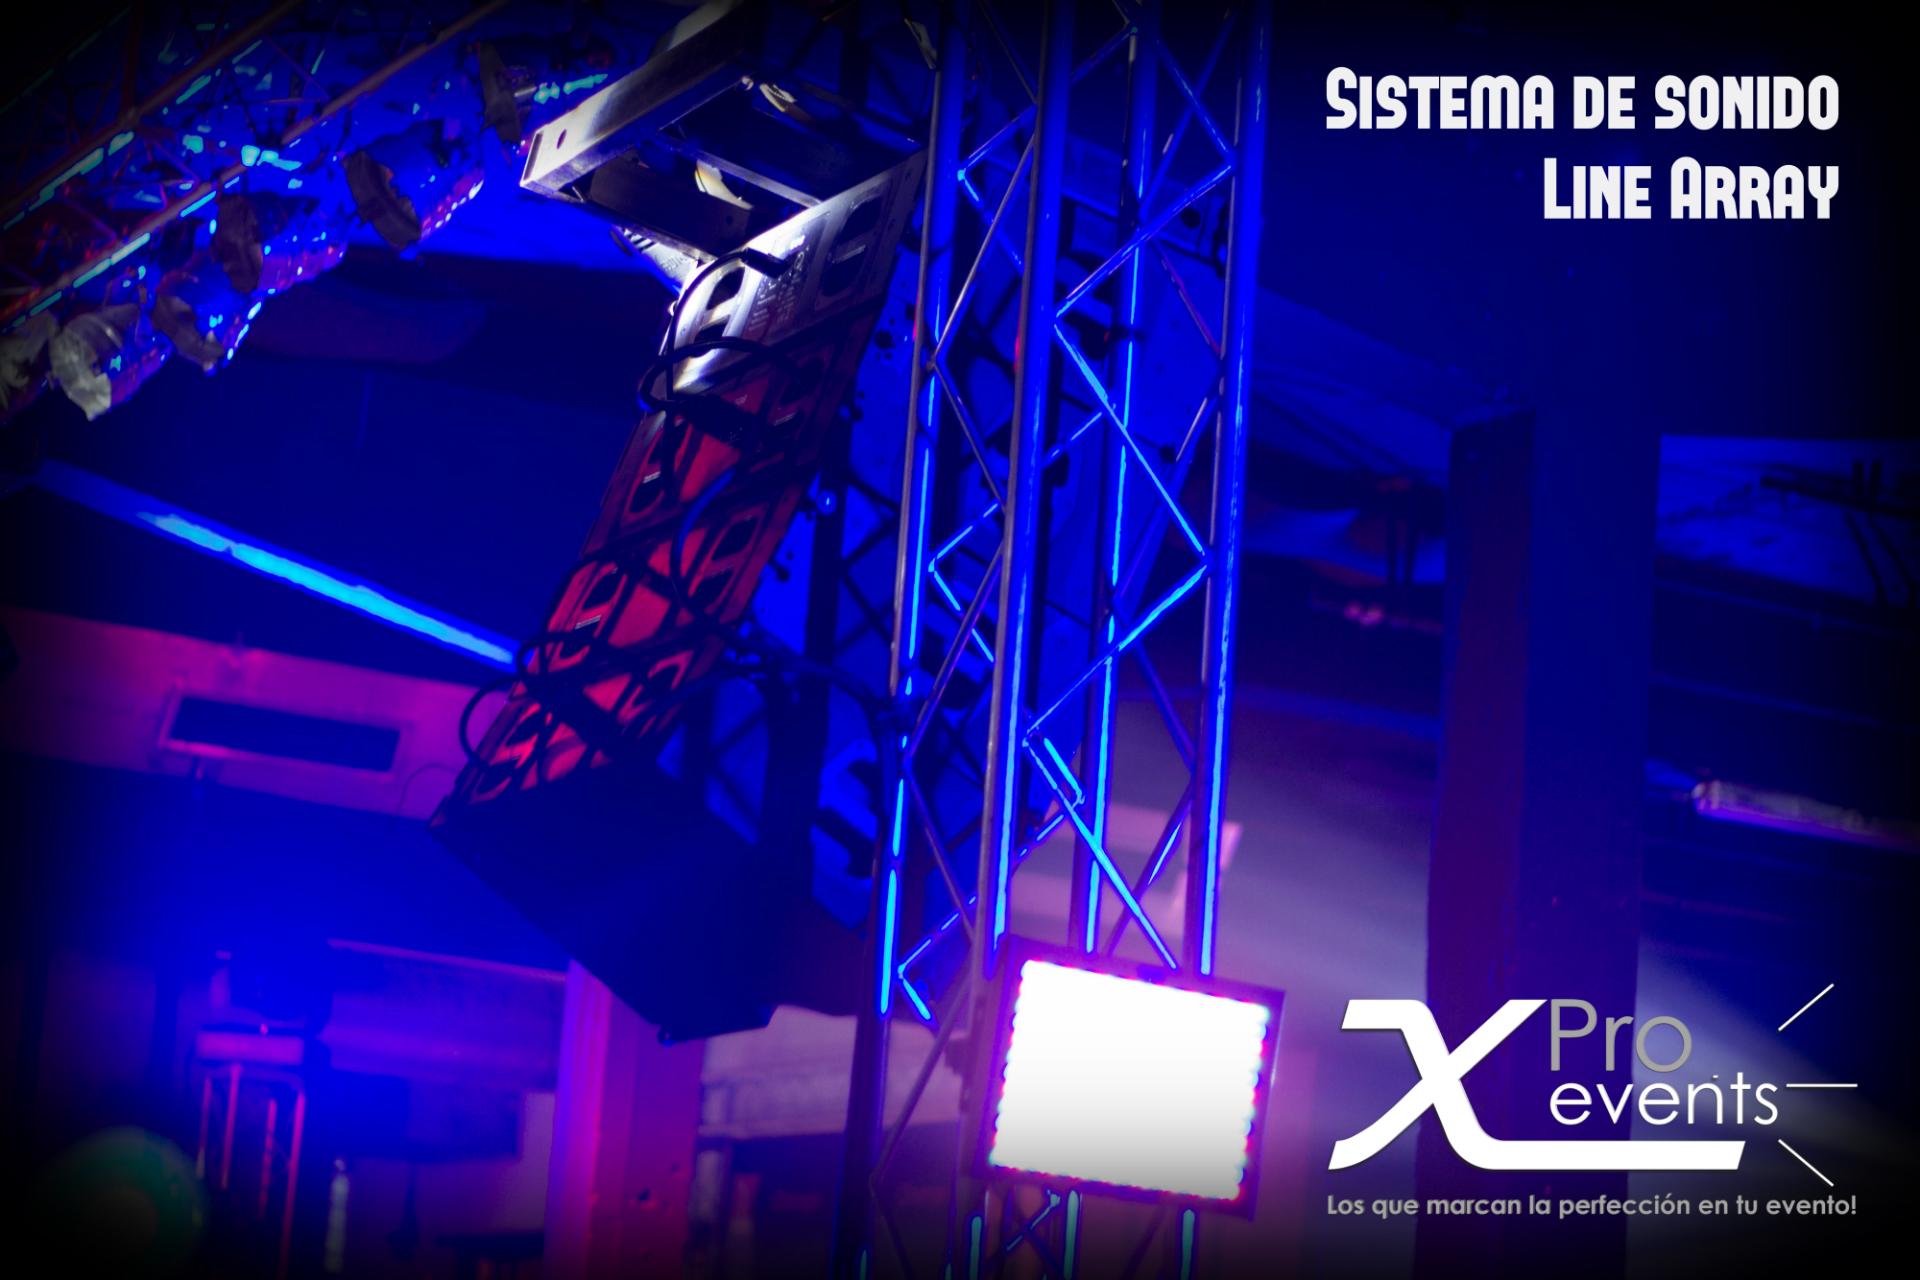 www.Xproevents.com - Sistema de sonido profesional Line Array.jpg